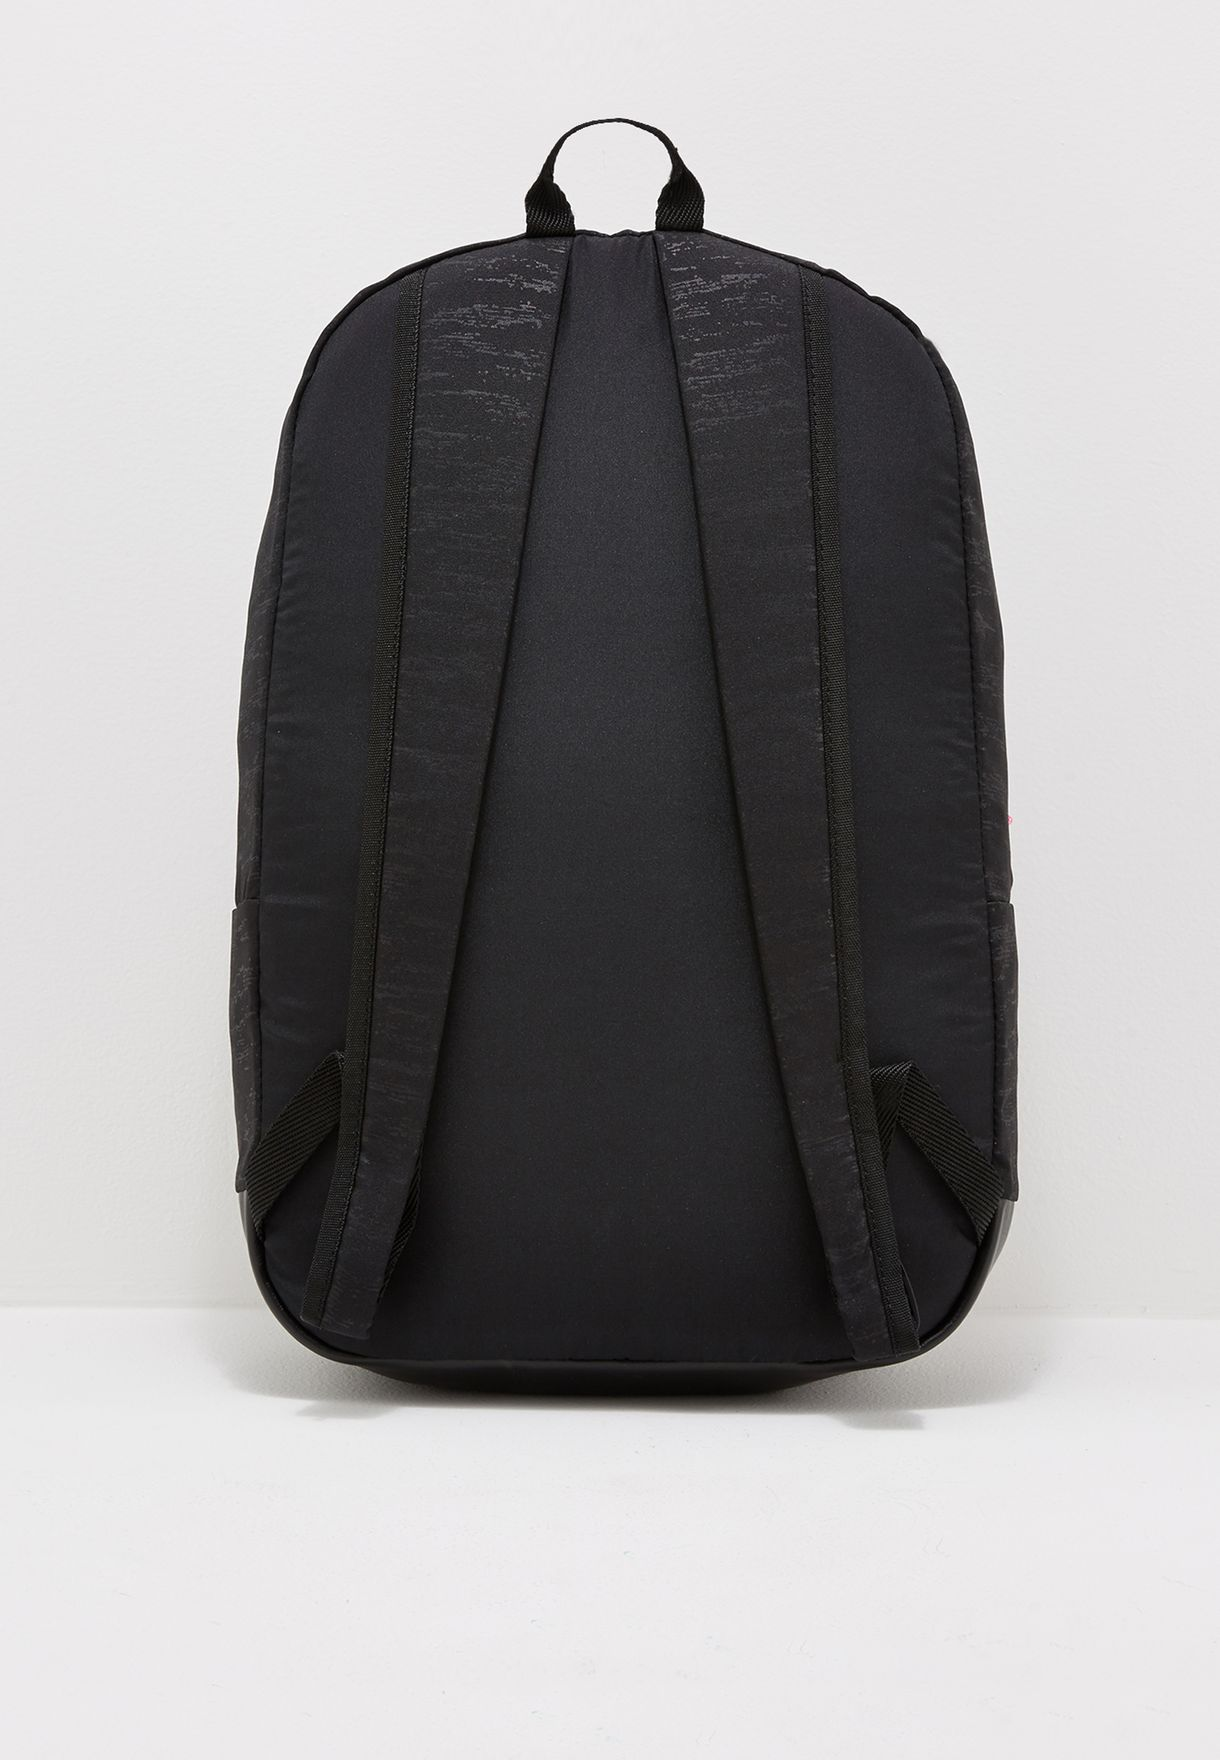 b8699409ca Shop PUMA black Prime Lux Backpack 07474701 for Women in Saudi ...